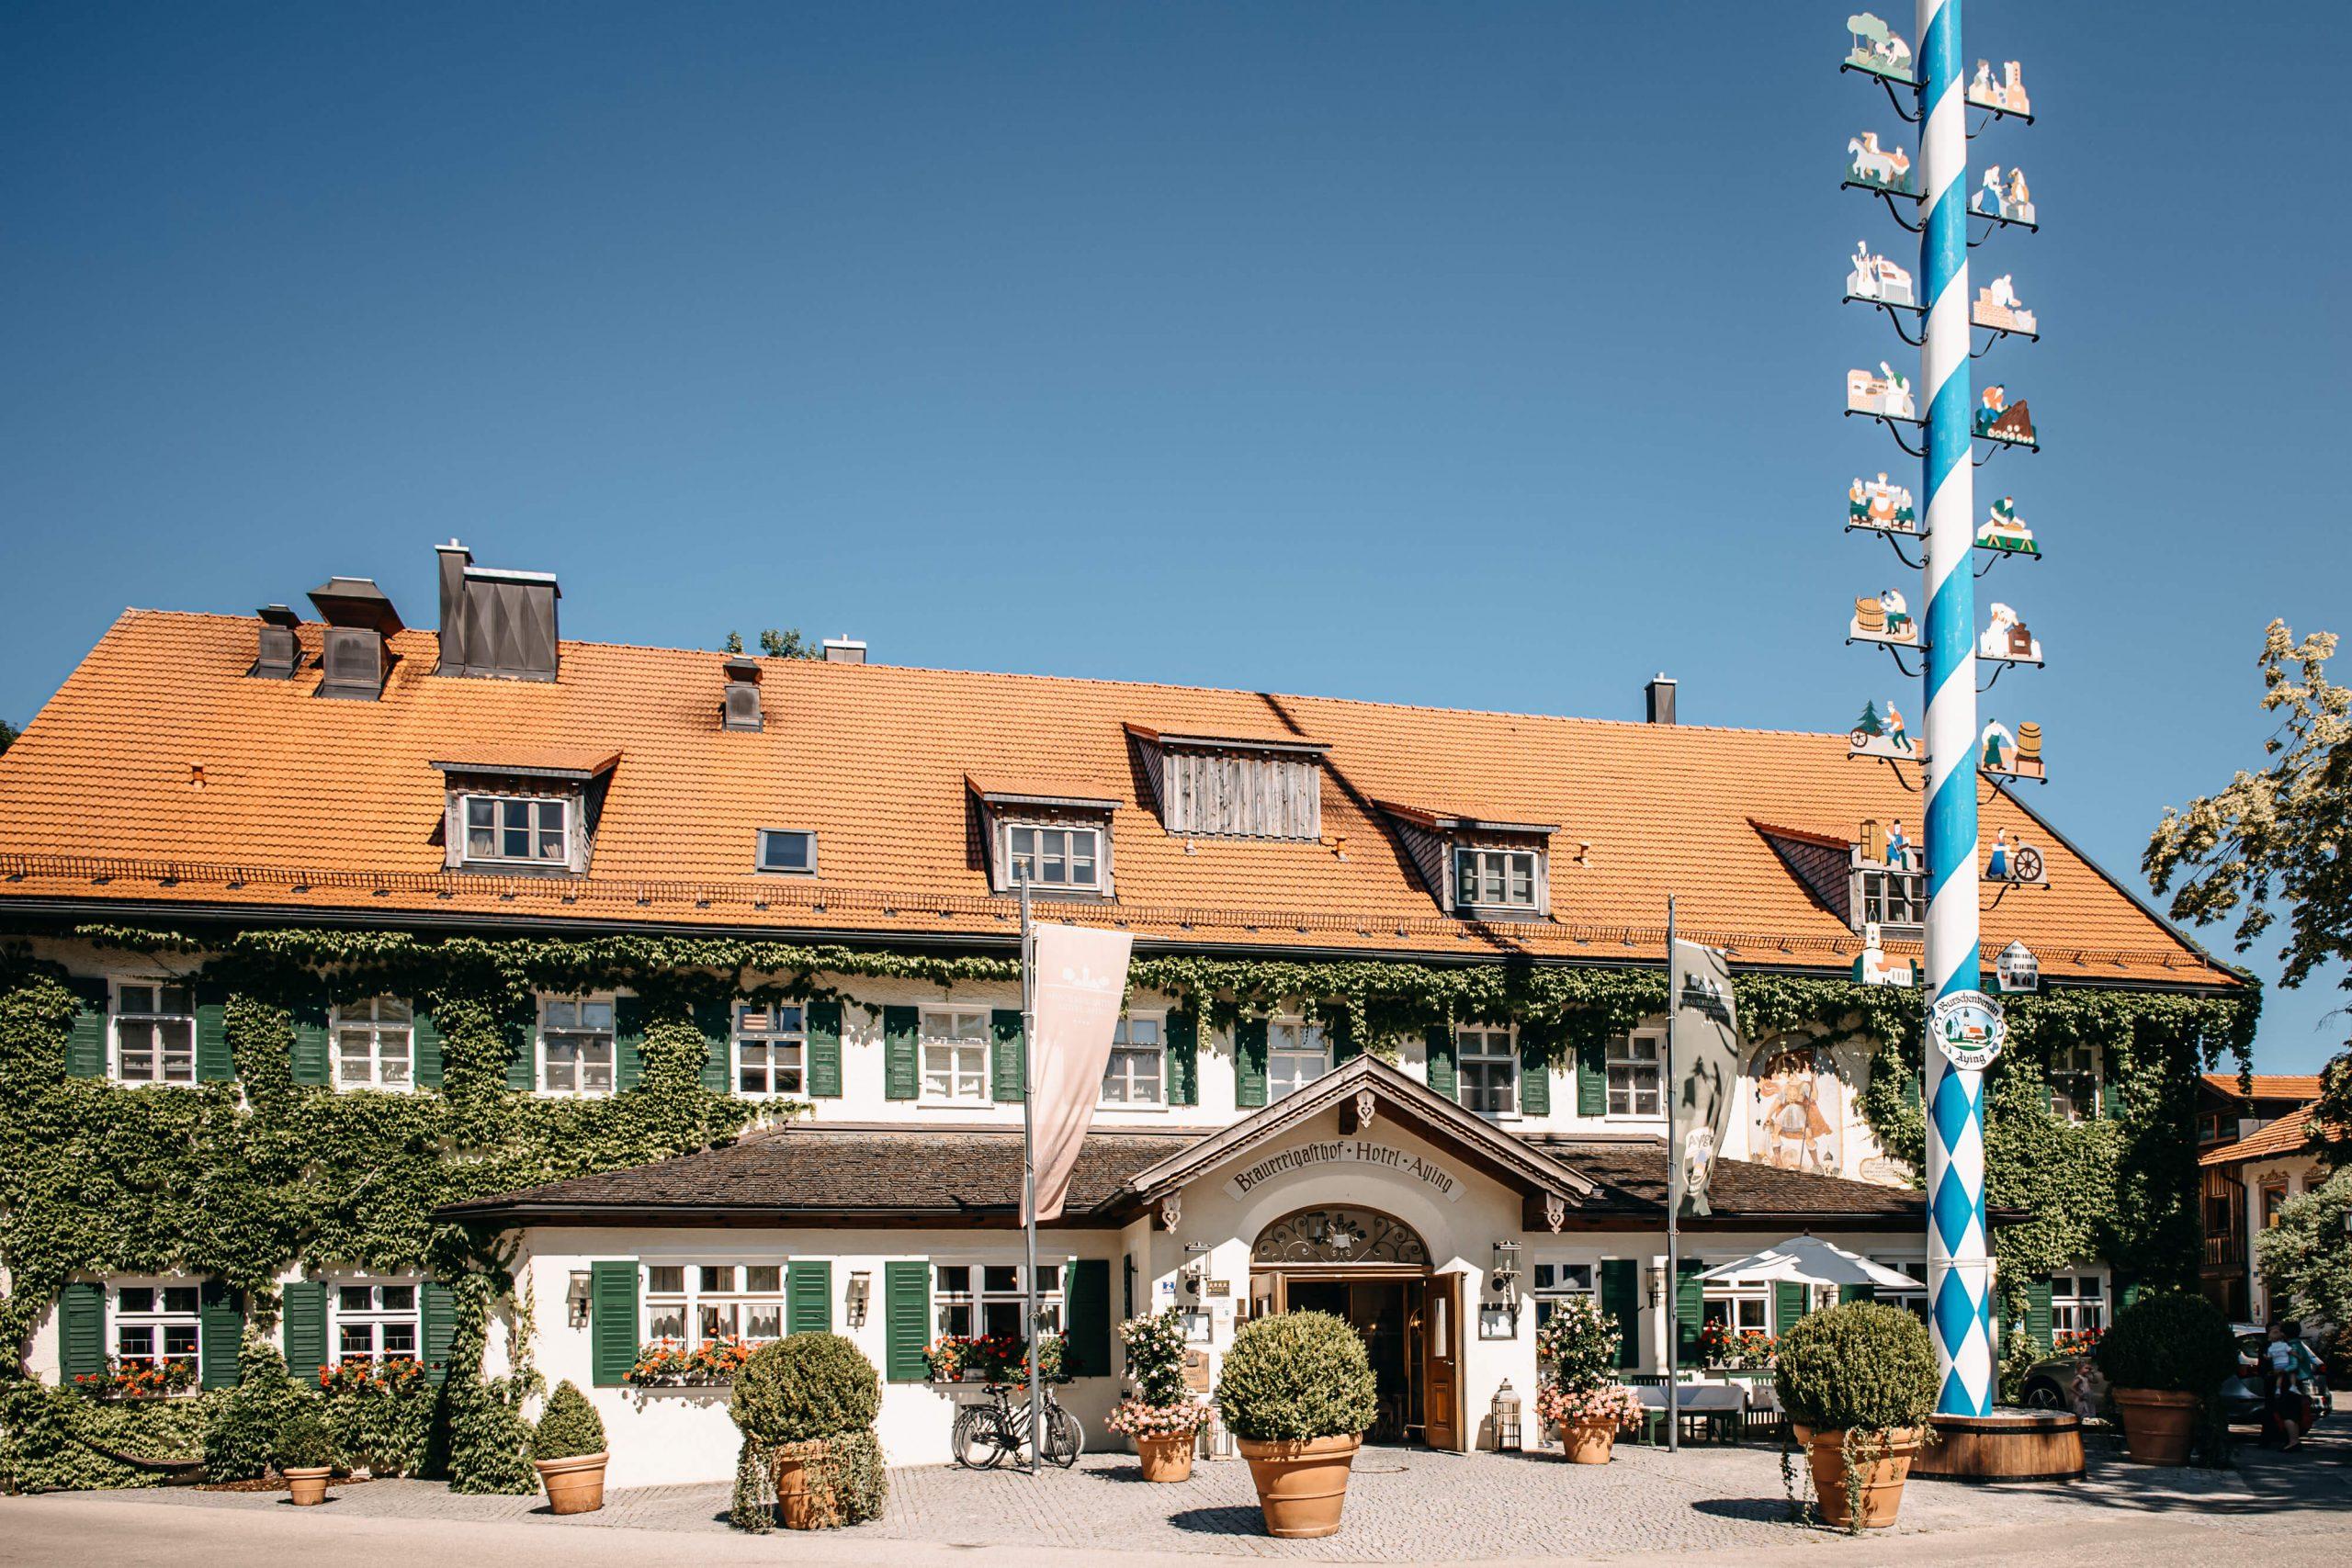 Brauereigasthof Hotel Aying | @linaundhans